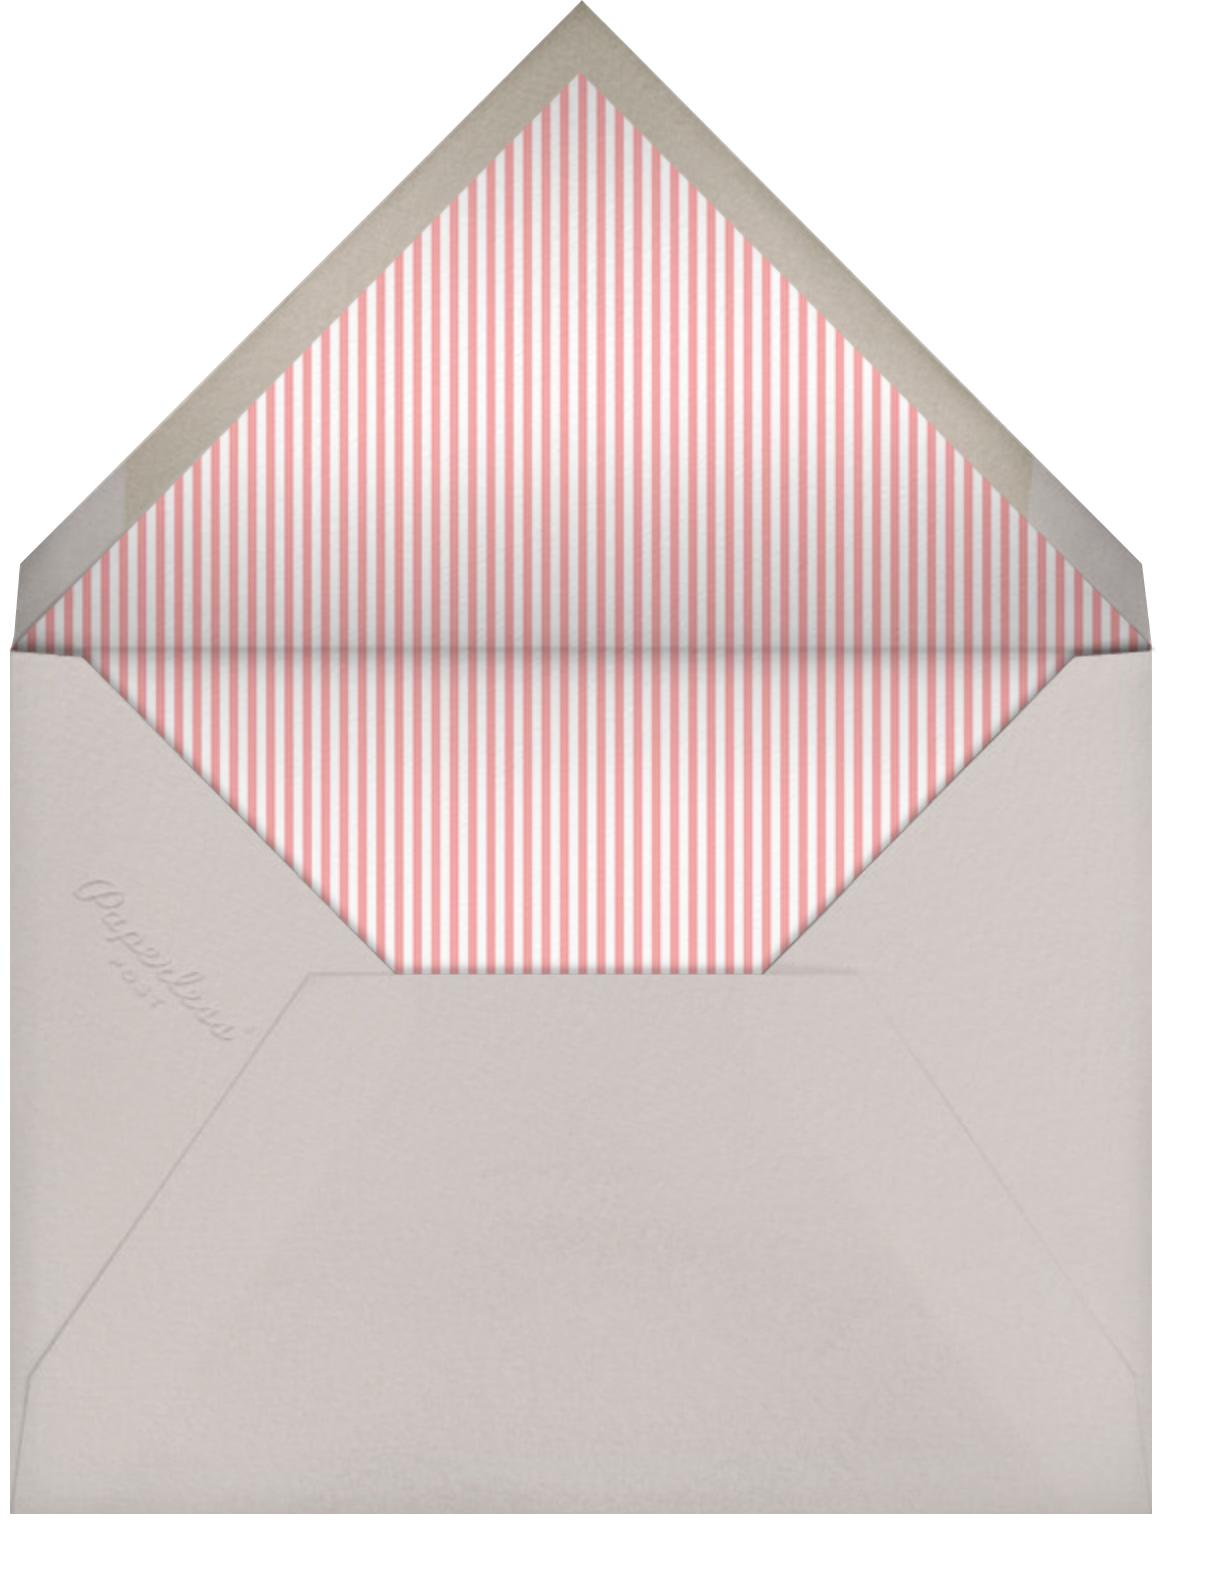 Little Heart Halo (Greeting)  - Little Cube - Valentine's Day - envelope back